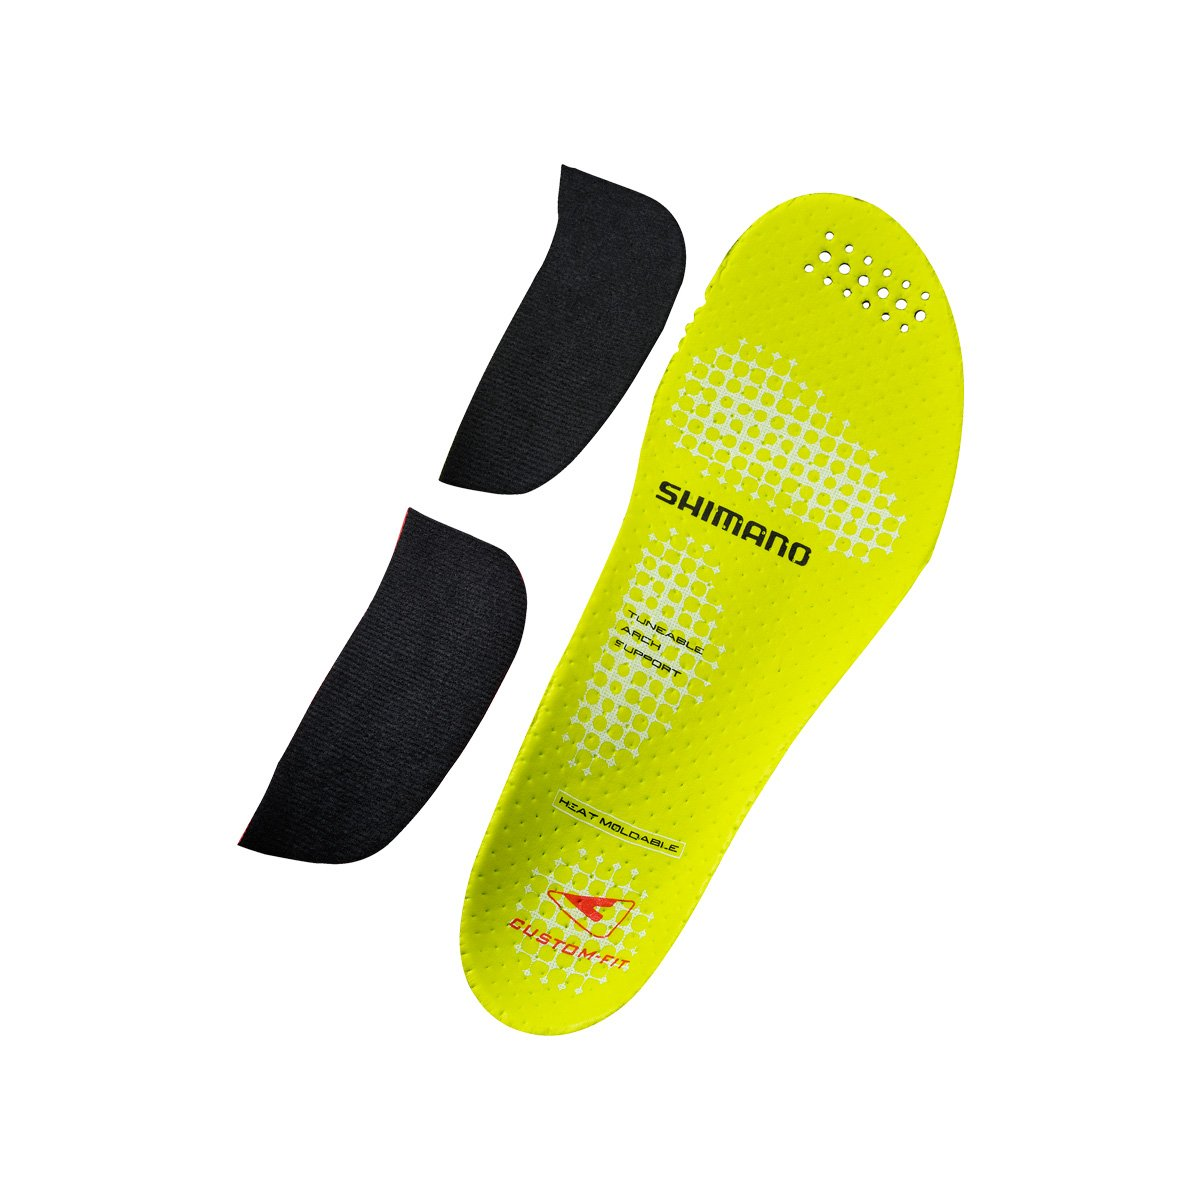 Shimano ESMSHRC9INCF サイクリングシューズ用インソール カスタムフィット 48-50.0 イエロー B06XK987WP